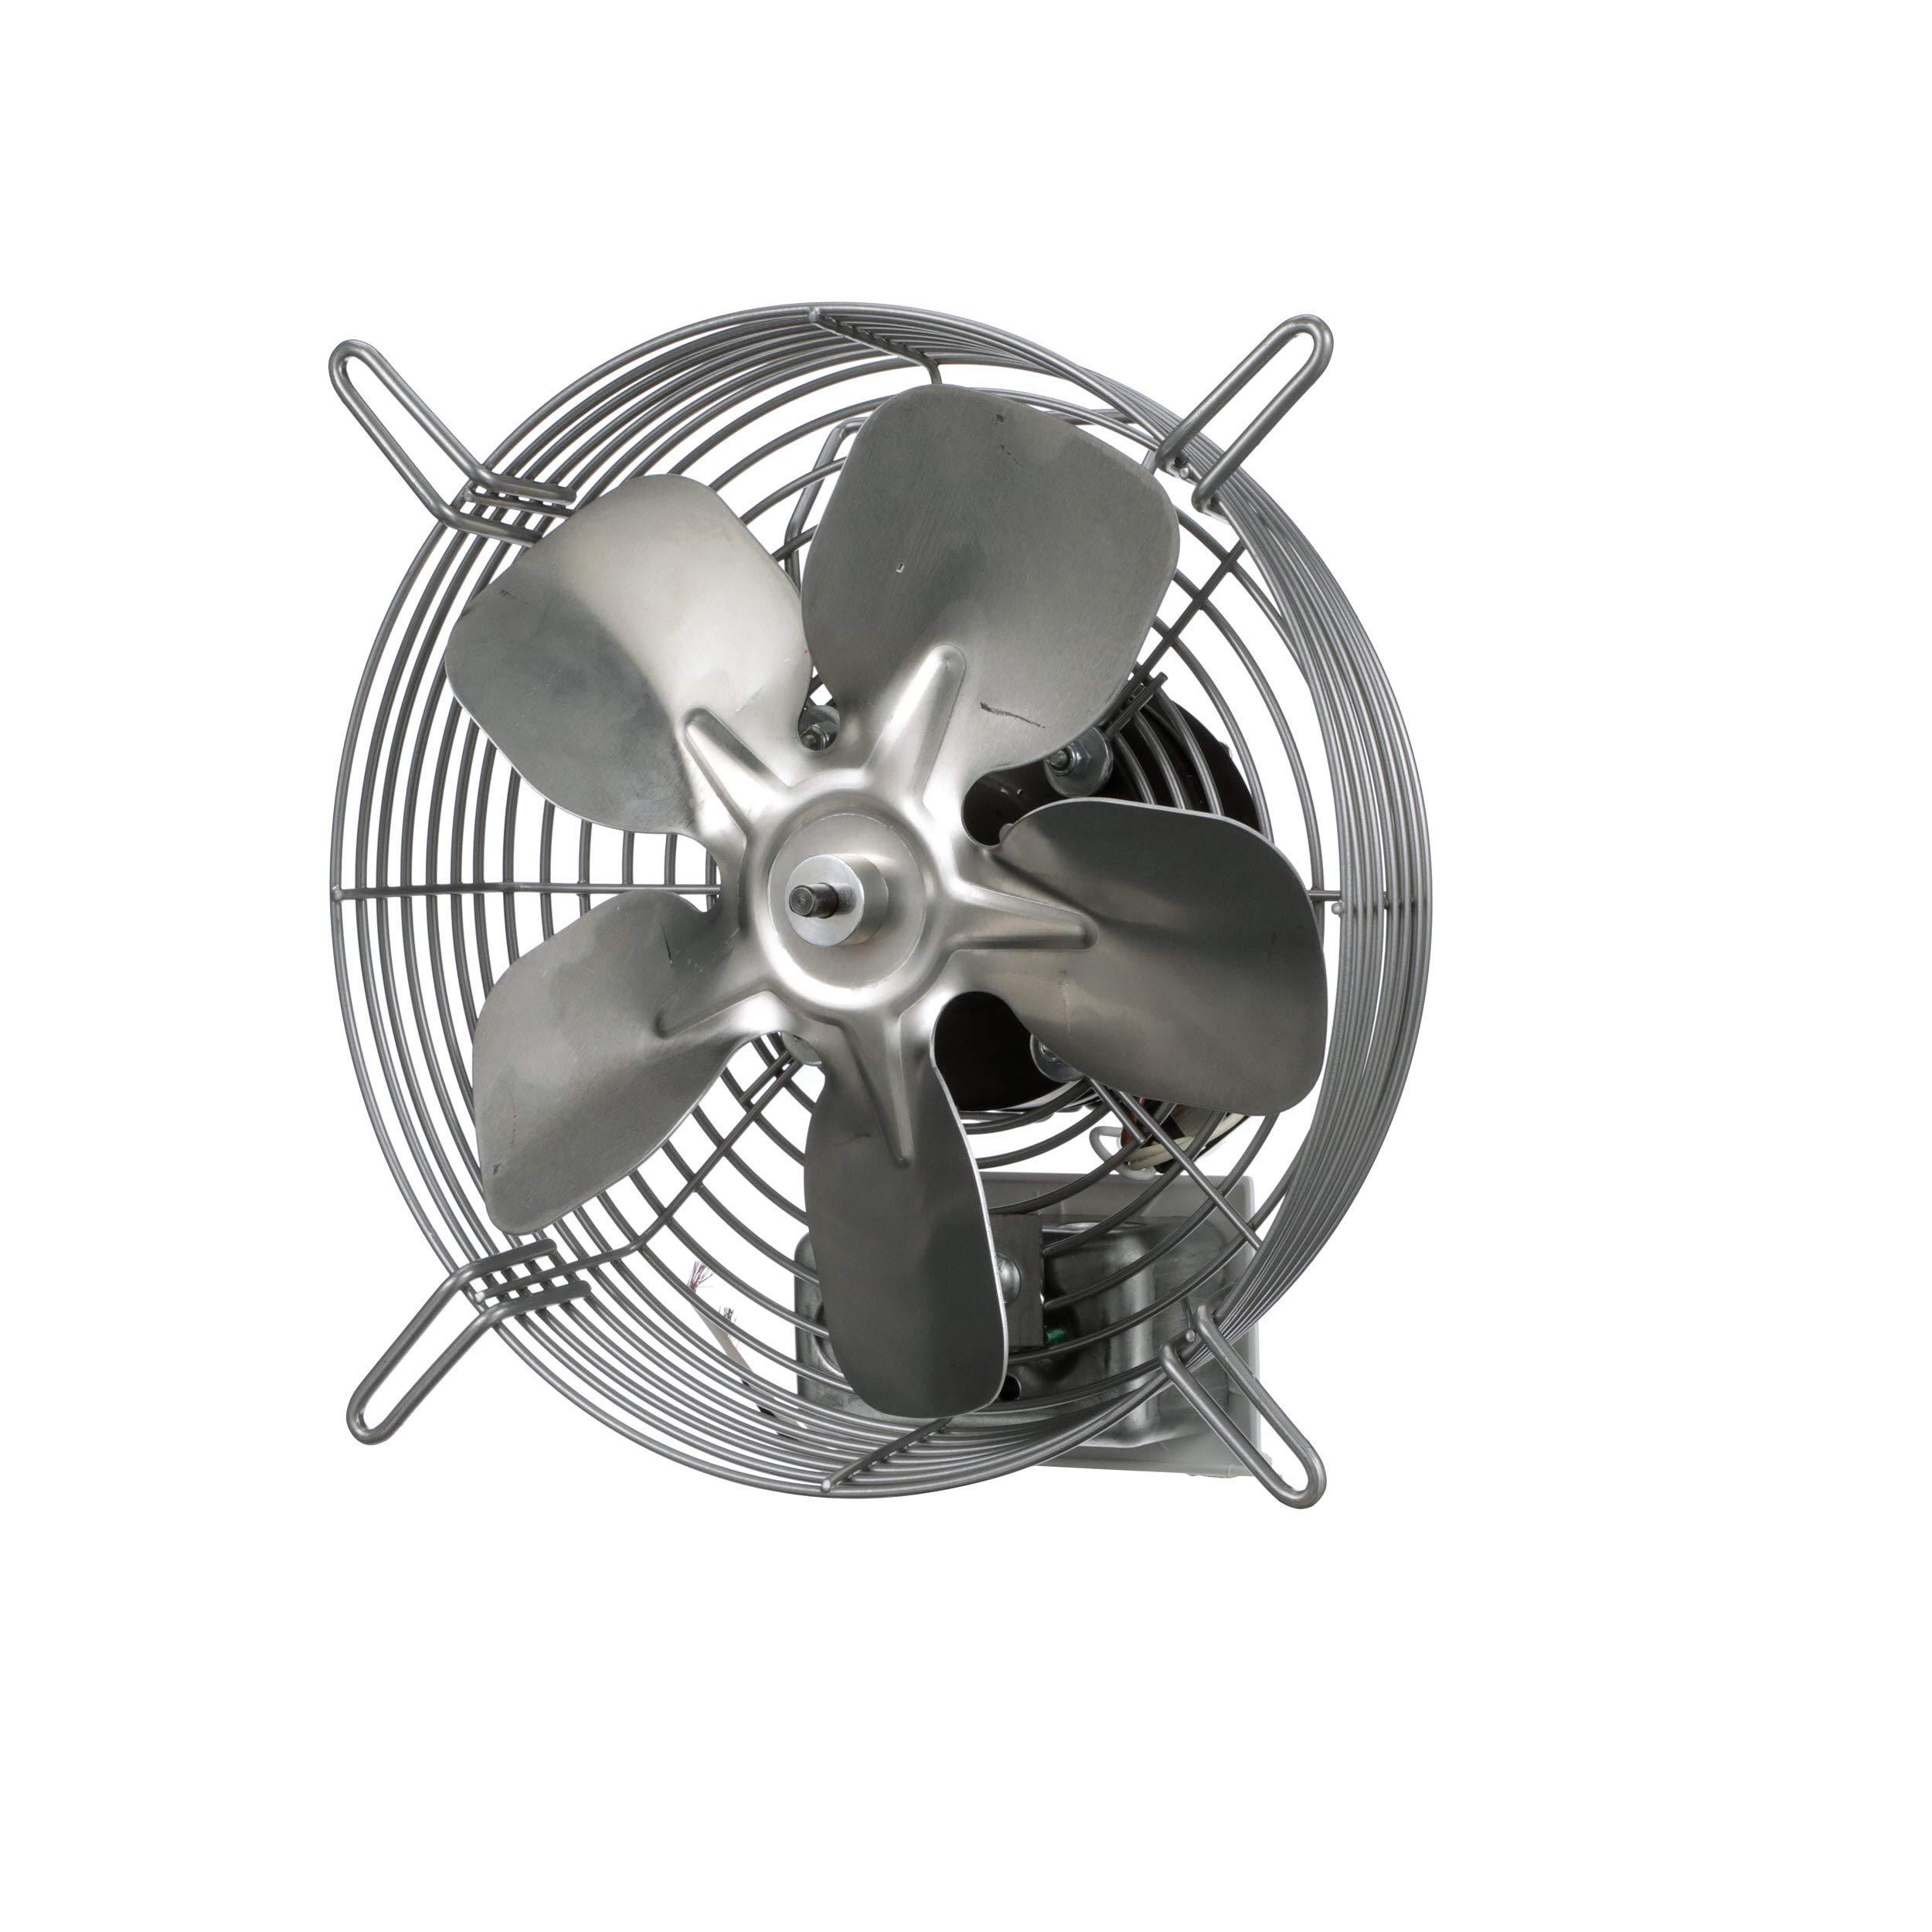 "TPI Corporation CE-10-D Direct Drive Exhaust Fan, Guard Mounted, Single Phase, 10"" Diameter, 120 Volt"